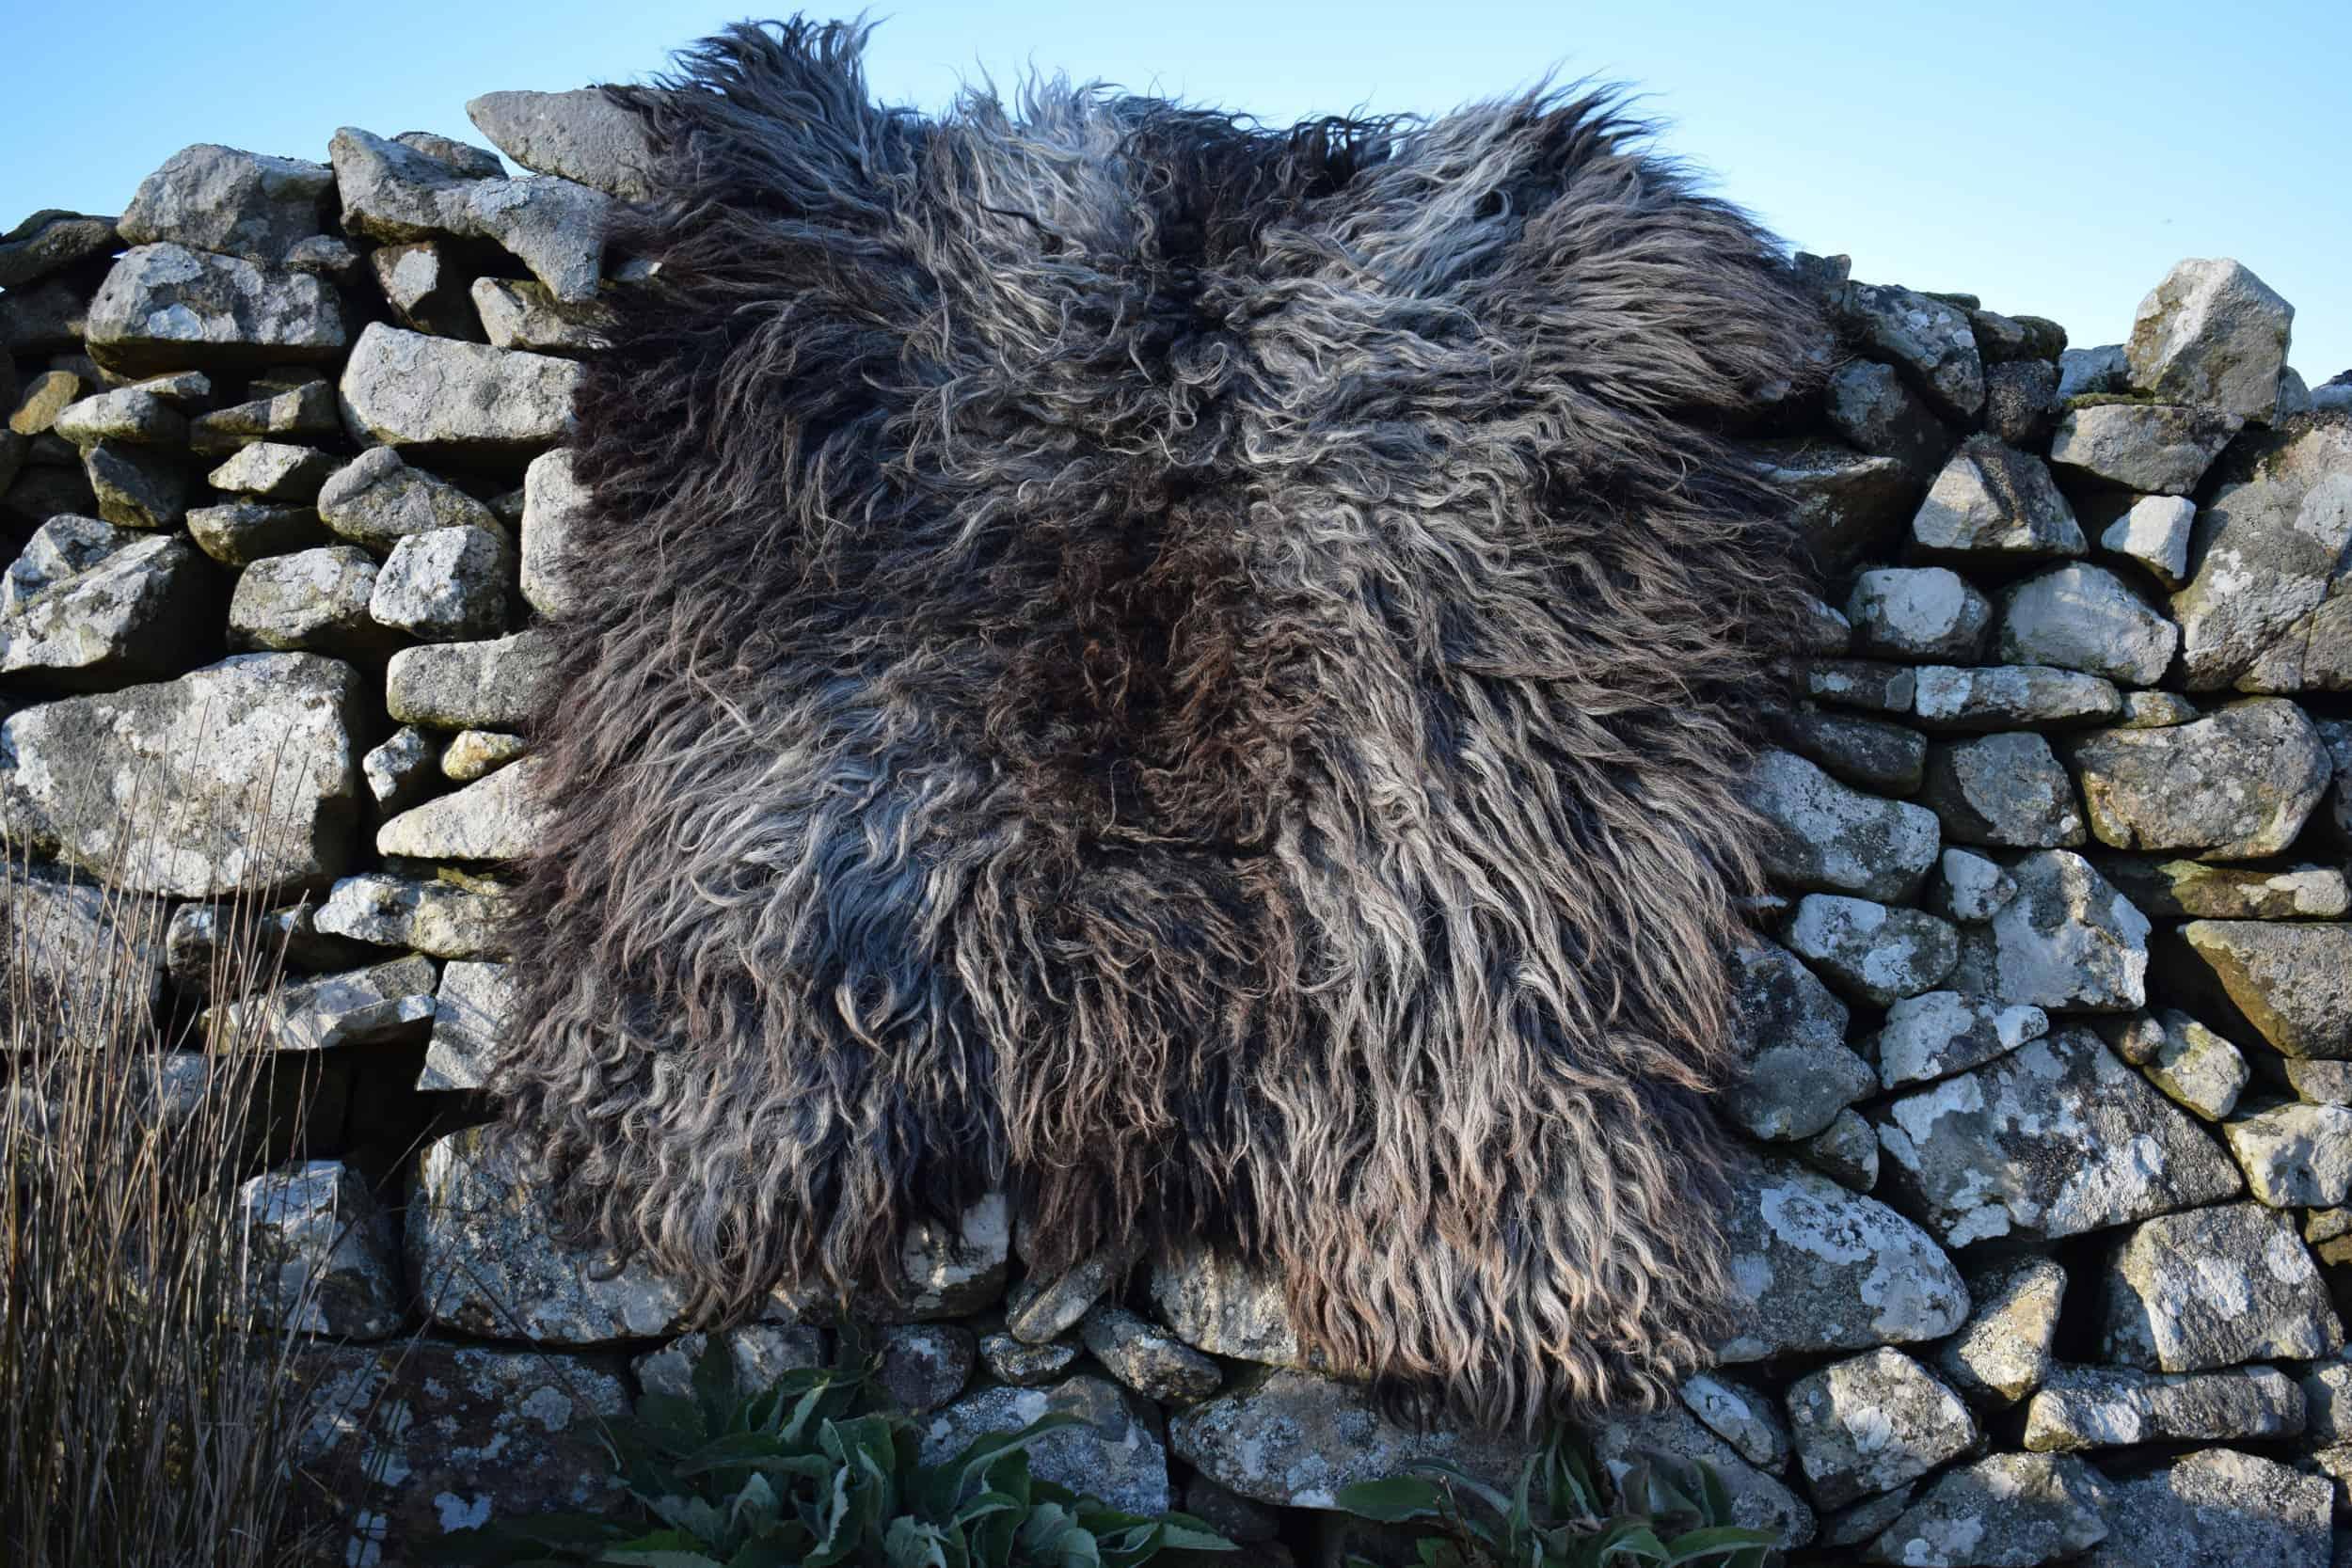 Gem felted fleece rug grey vegetarian sheepskinethical kindblack welsh mountain jacob shetland cross sheeo wild hairy black beauty